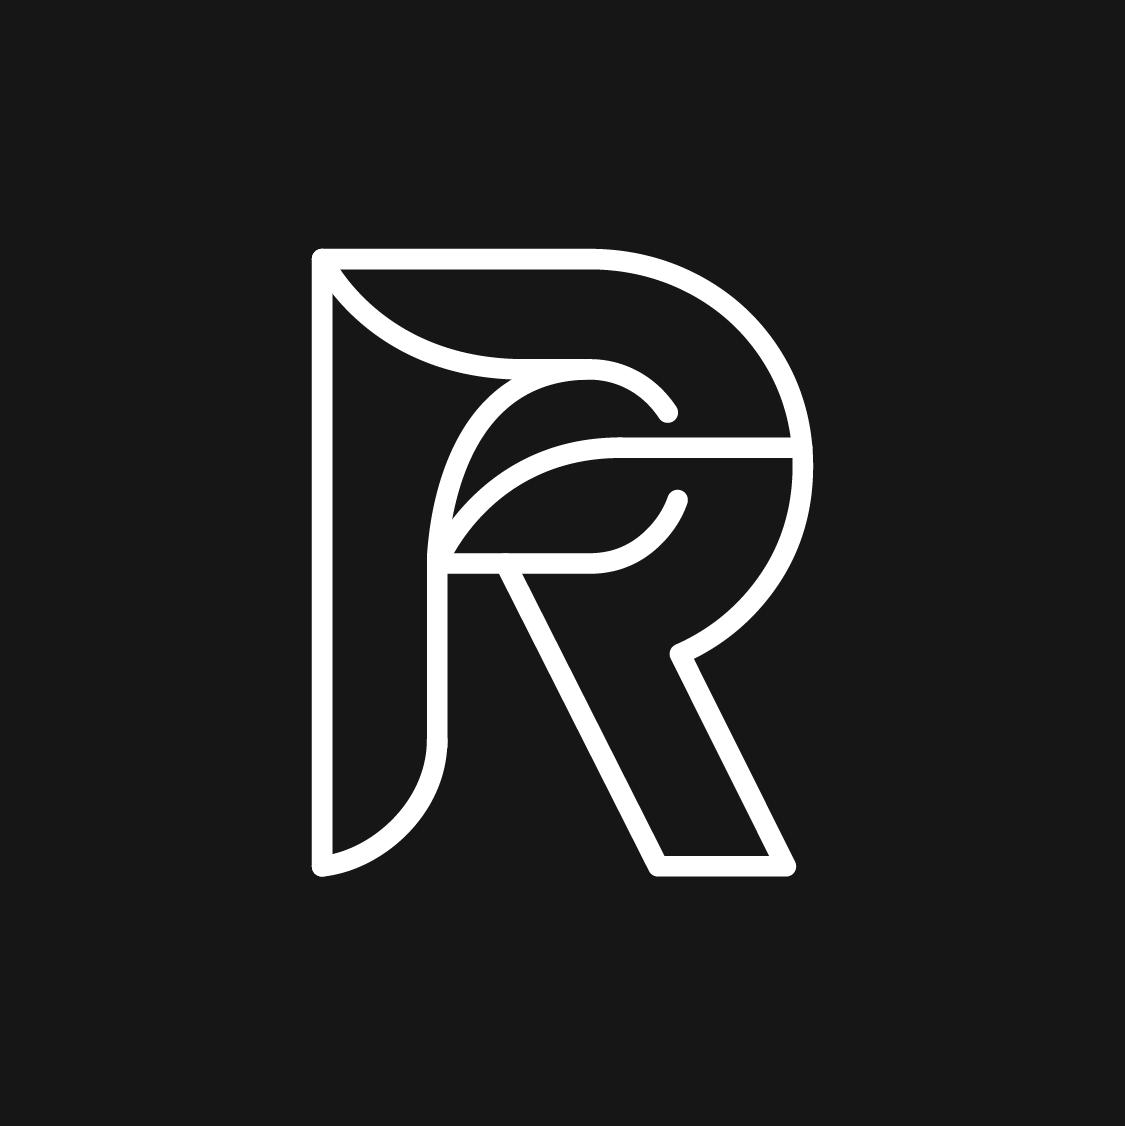 all-logos-2020-86